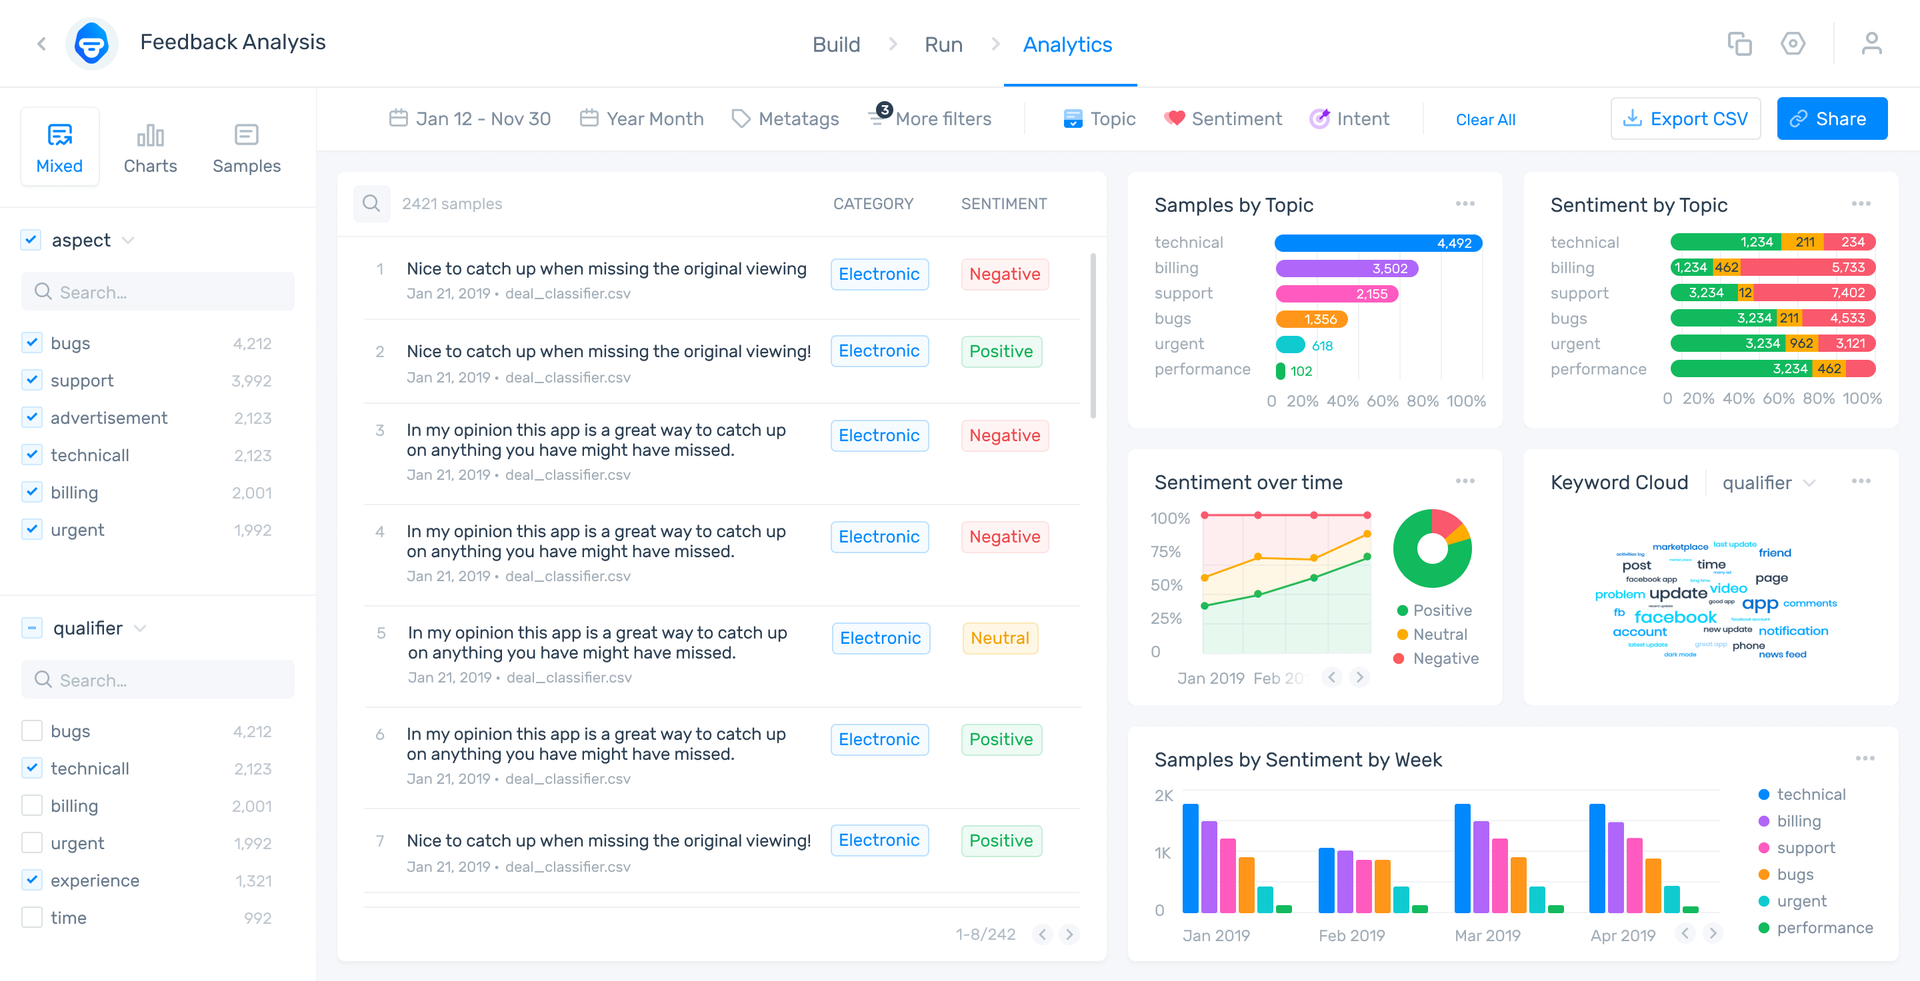 Visual dashboard built on MonkeyLearn Studio showing customer feedback analysis